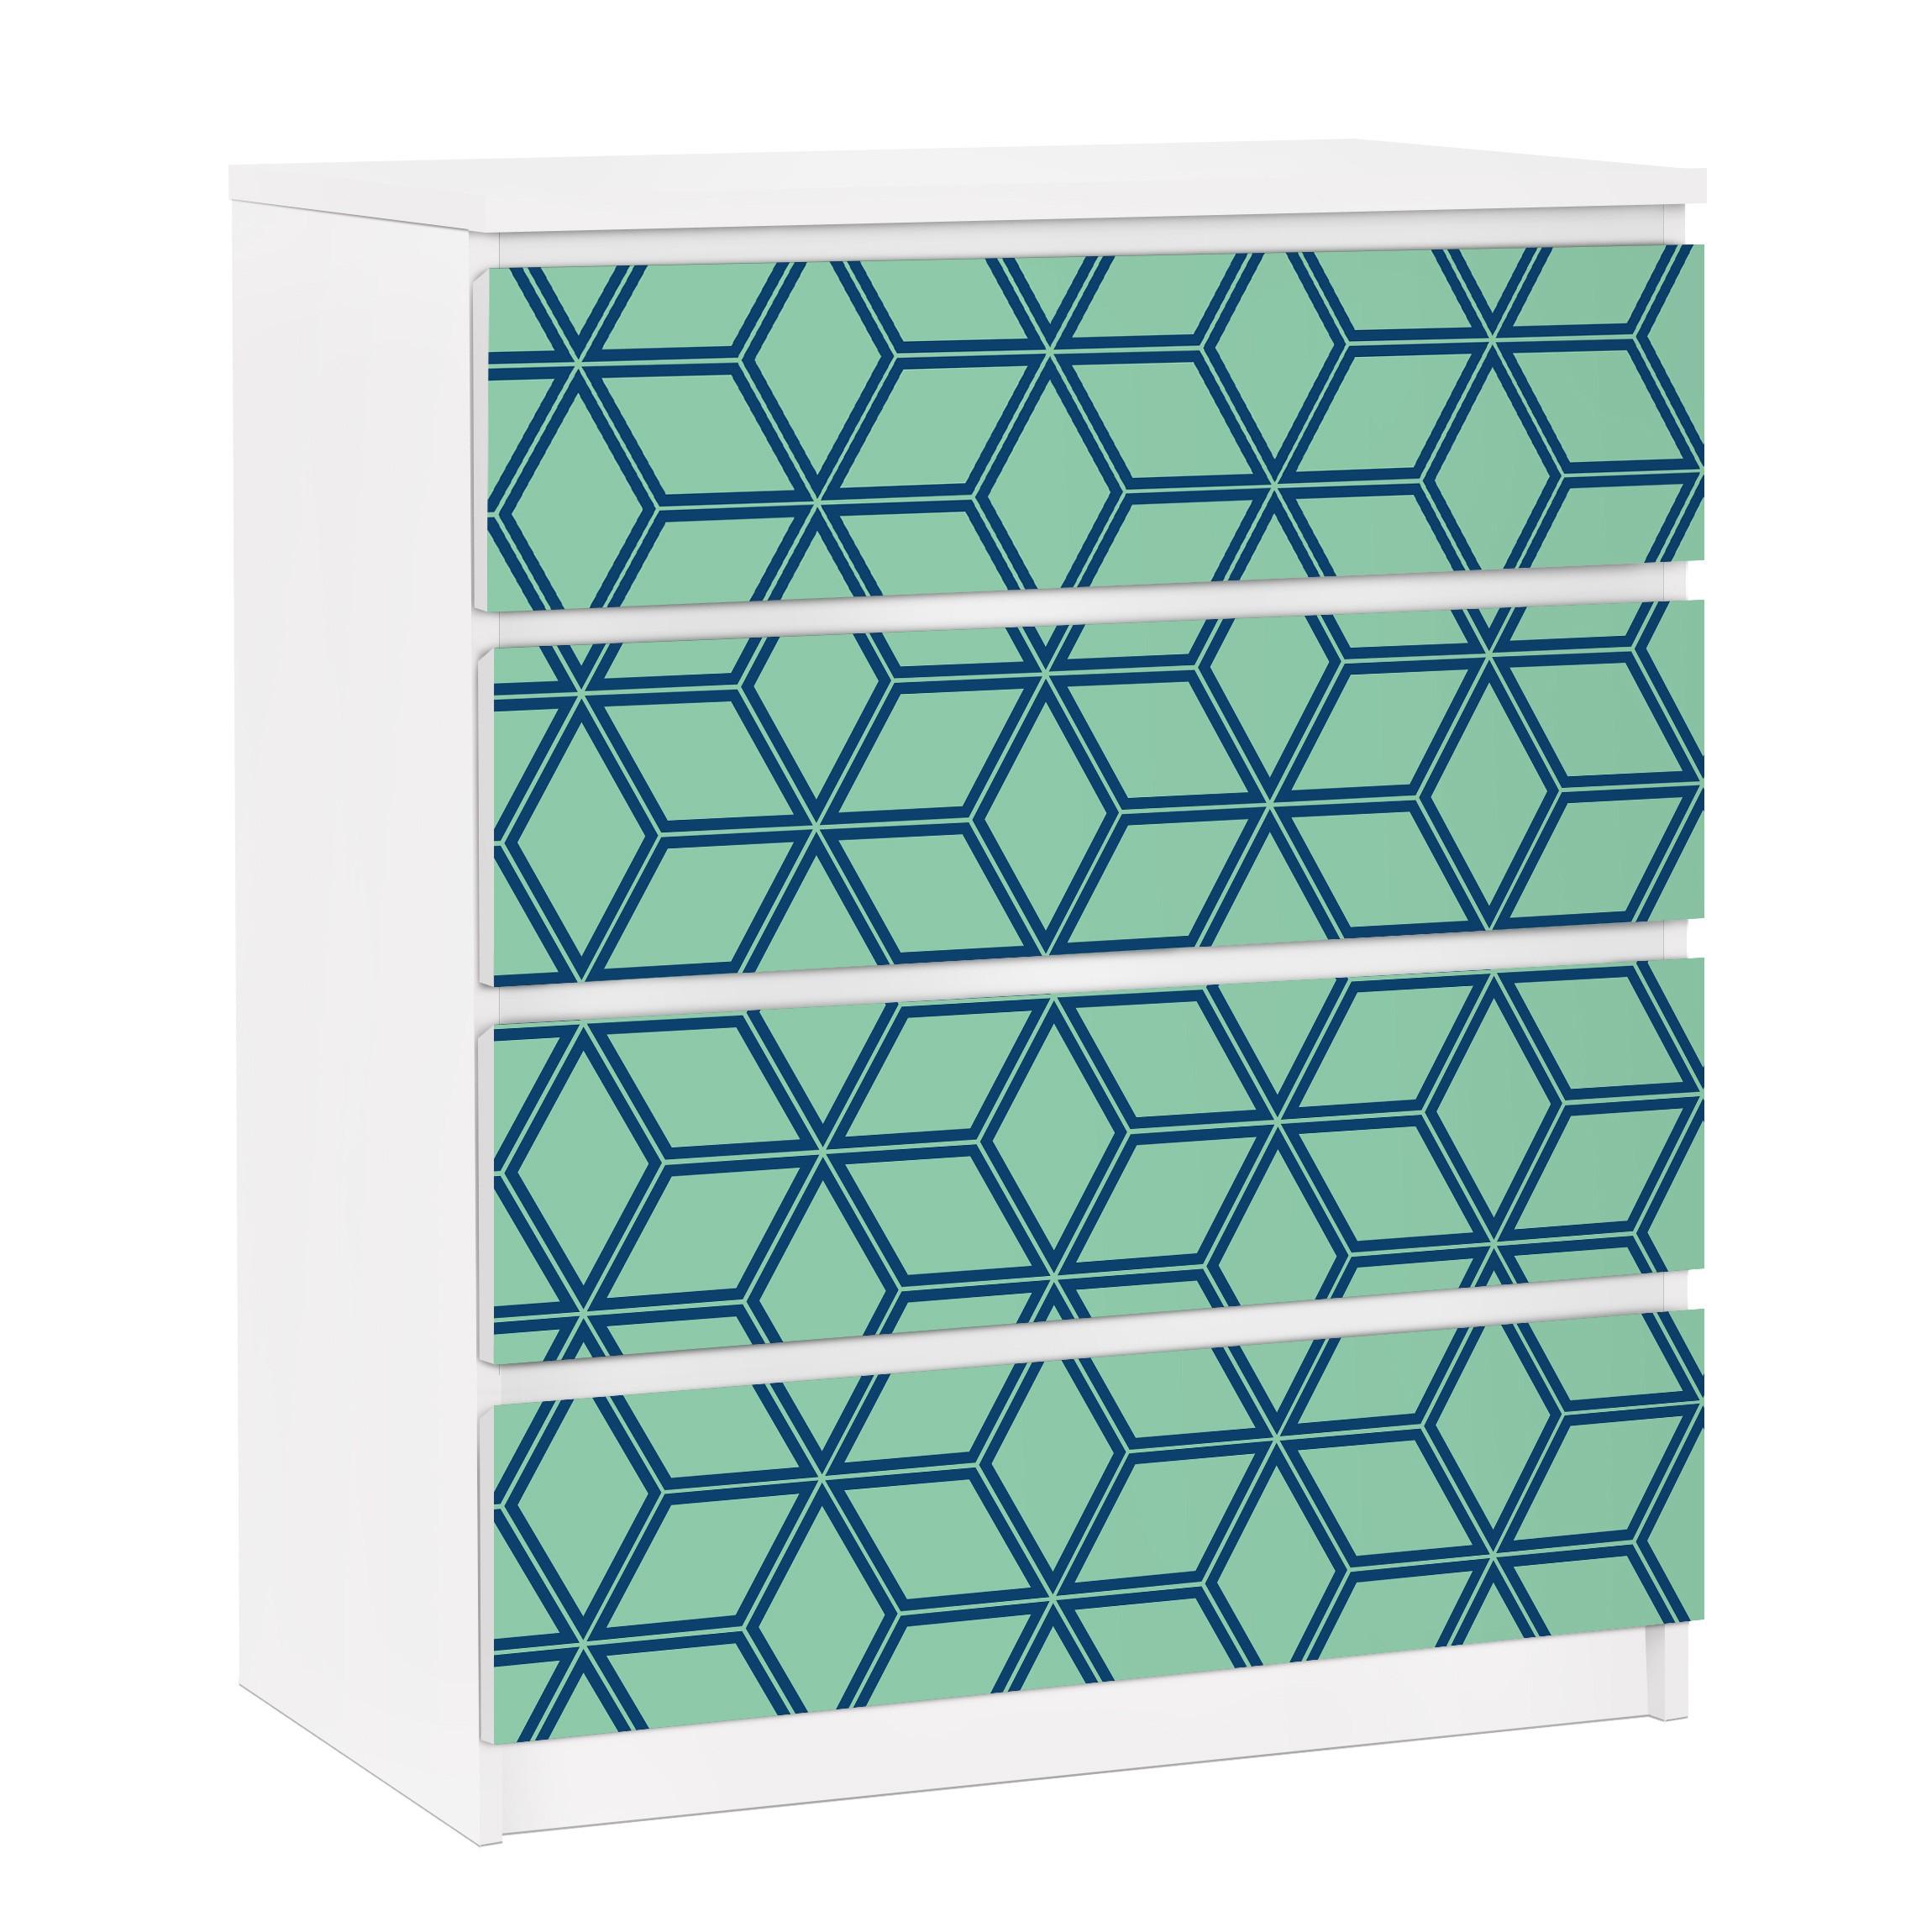 Furniture decal for ikea malm dresser 4xdrawers cube for Carta adesiva per mobili ikea